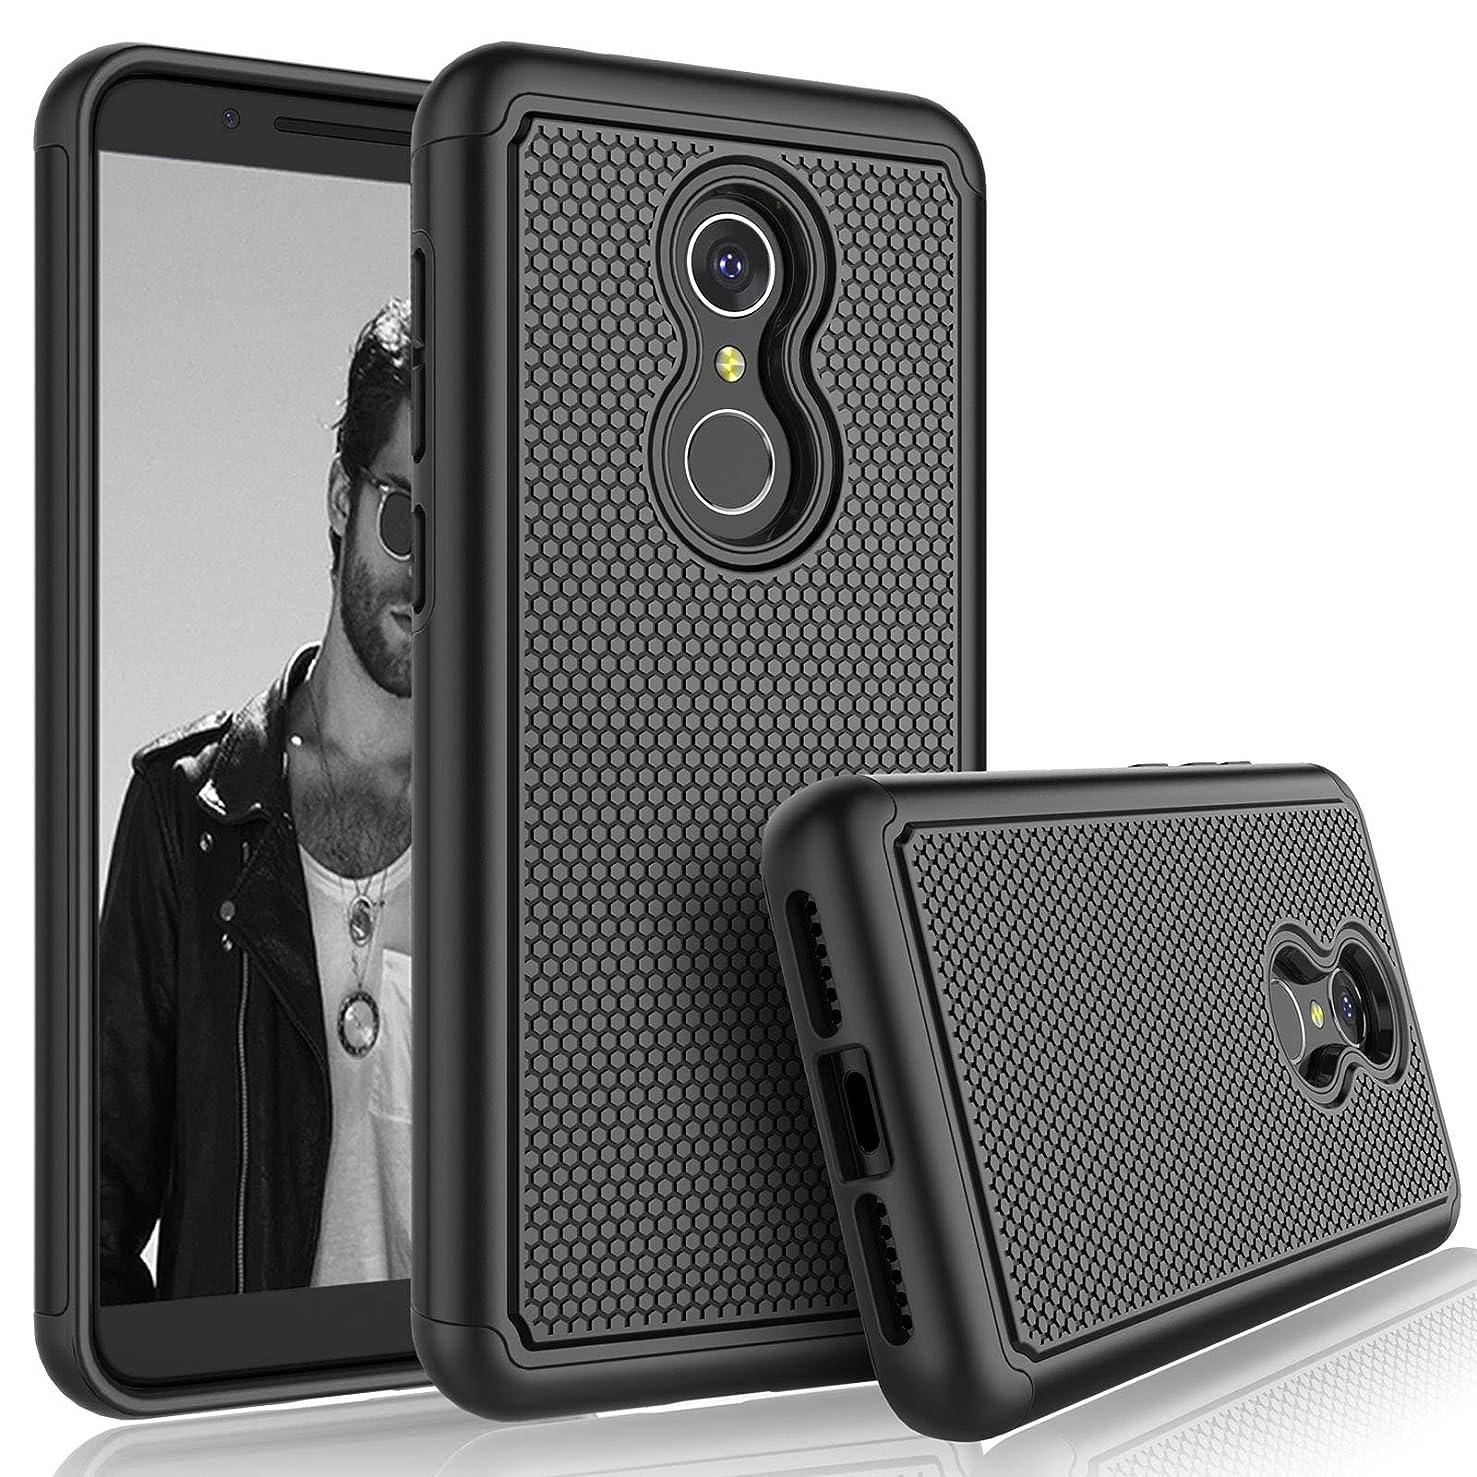 T-Mobile Revvl 2 Case, Alcatle 5052W / Alcatel 3 Sturdy Case, Tekcoo [Tmajor] Shock Absorbing Rubber Silicone & Plastic Scratch Resistant Bumper Grip Rugged Cute Hard Phone Cases Cover [Black]